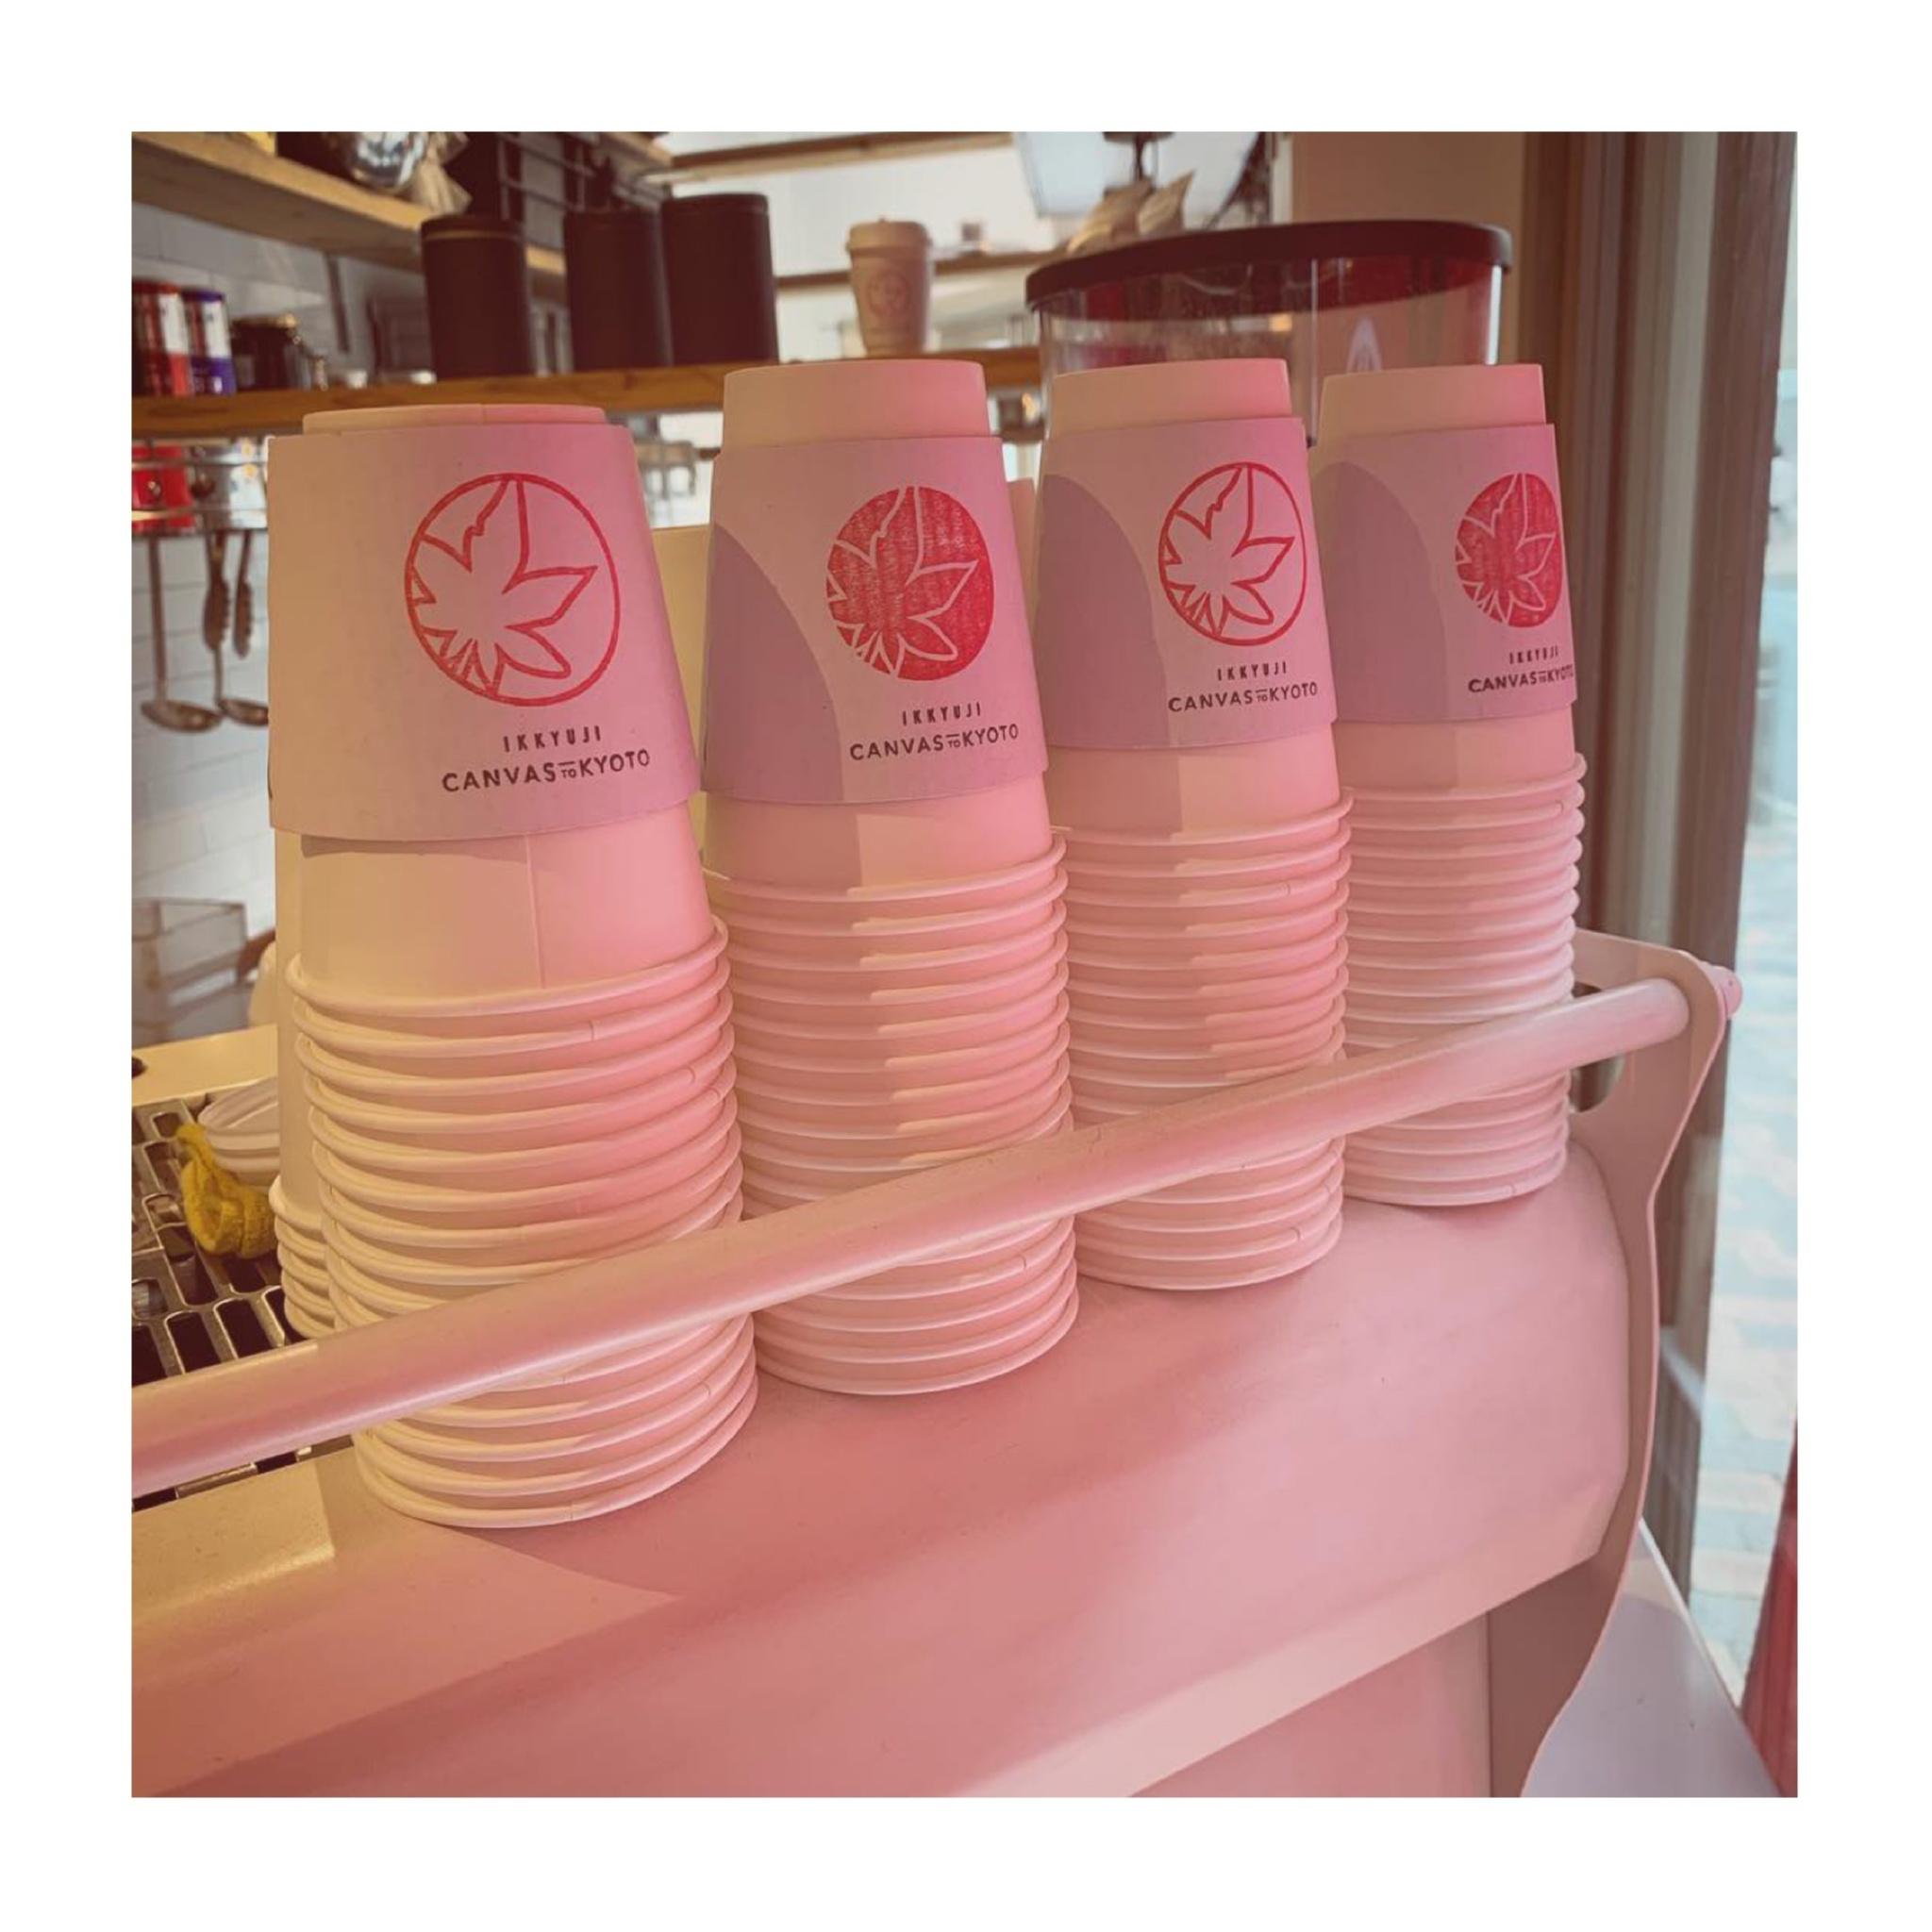 #19【#cafestagram】❤️:《東京•広尾》〜11/25まで期間限定!大人気カフェ『CANVAS TOKYO』で飲める紅葉のカラーラテをチェック☻_3